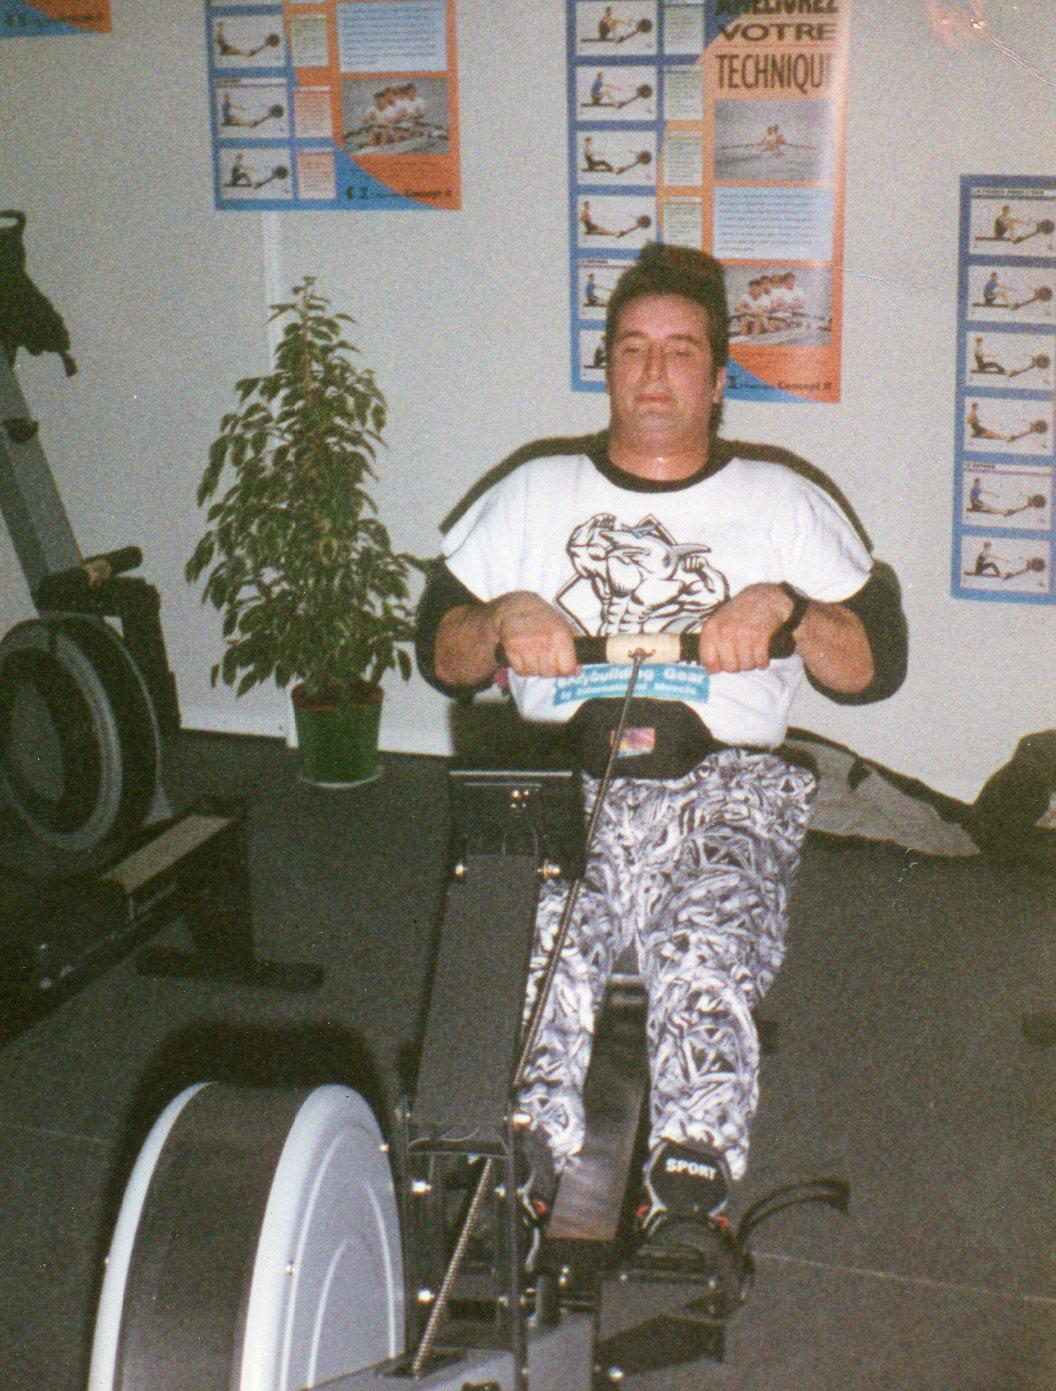 http://images.onlc.eu/muscle-catrinOEU//130608004920.jpg